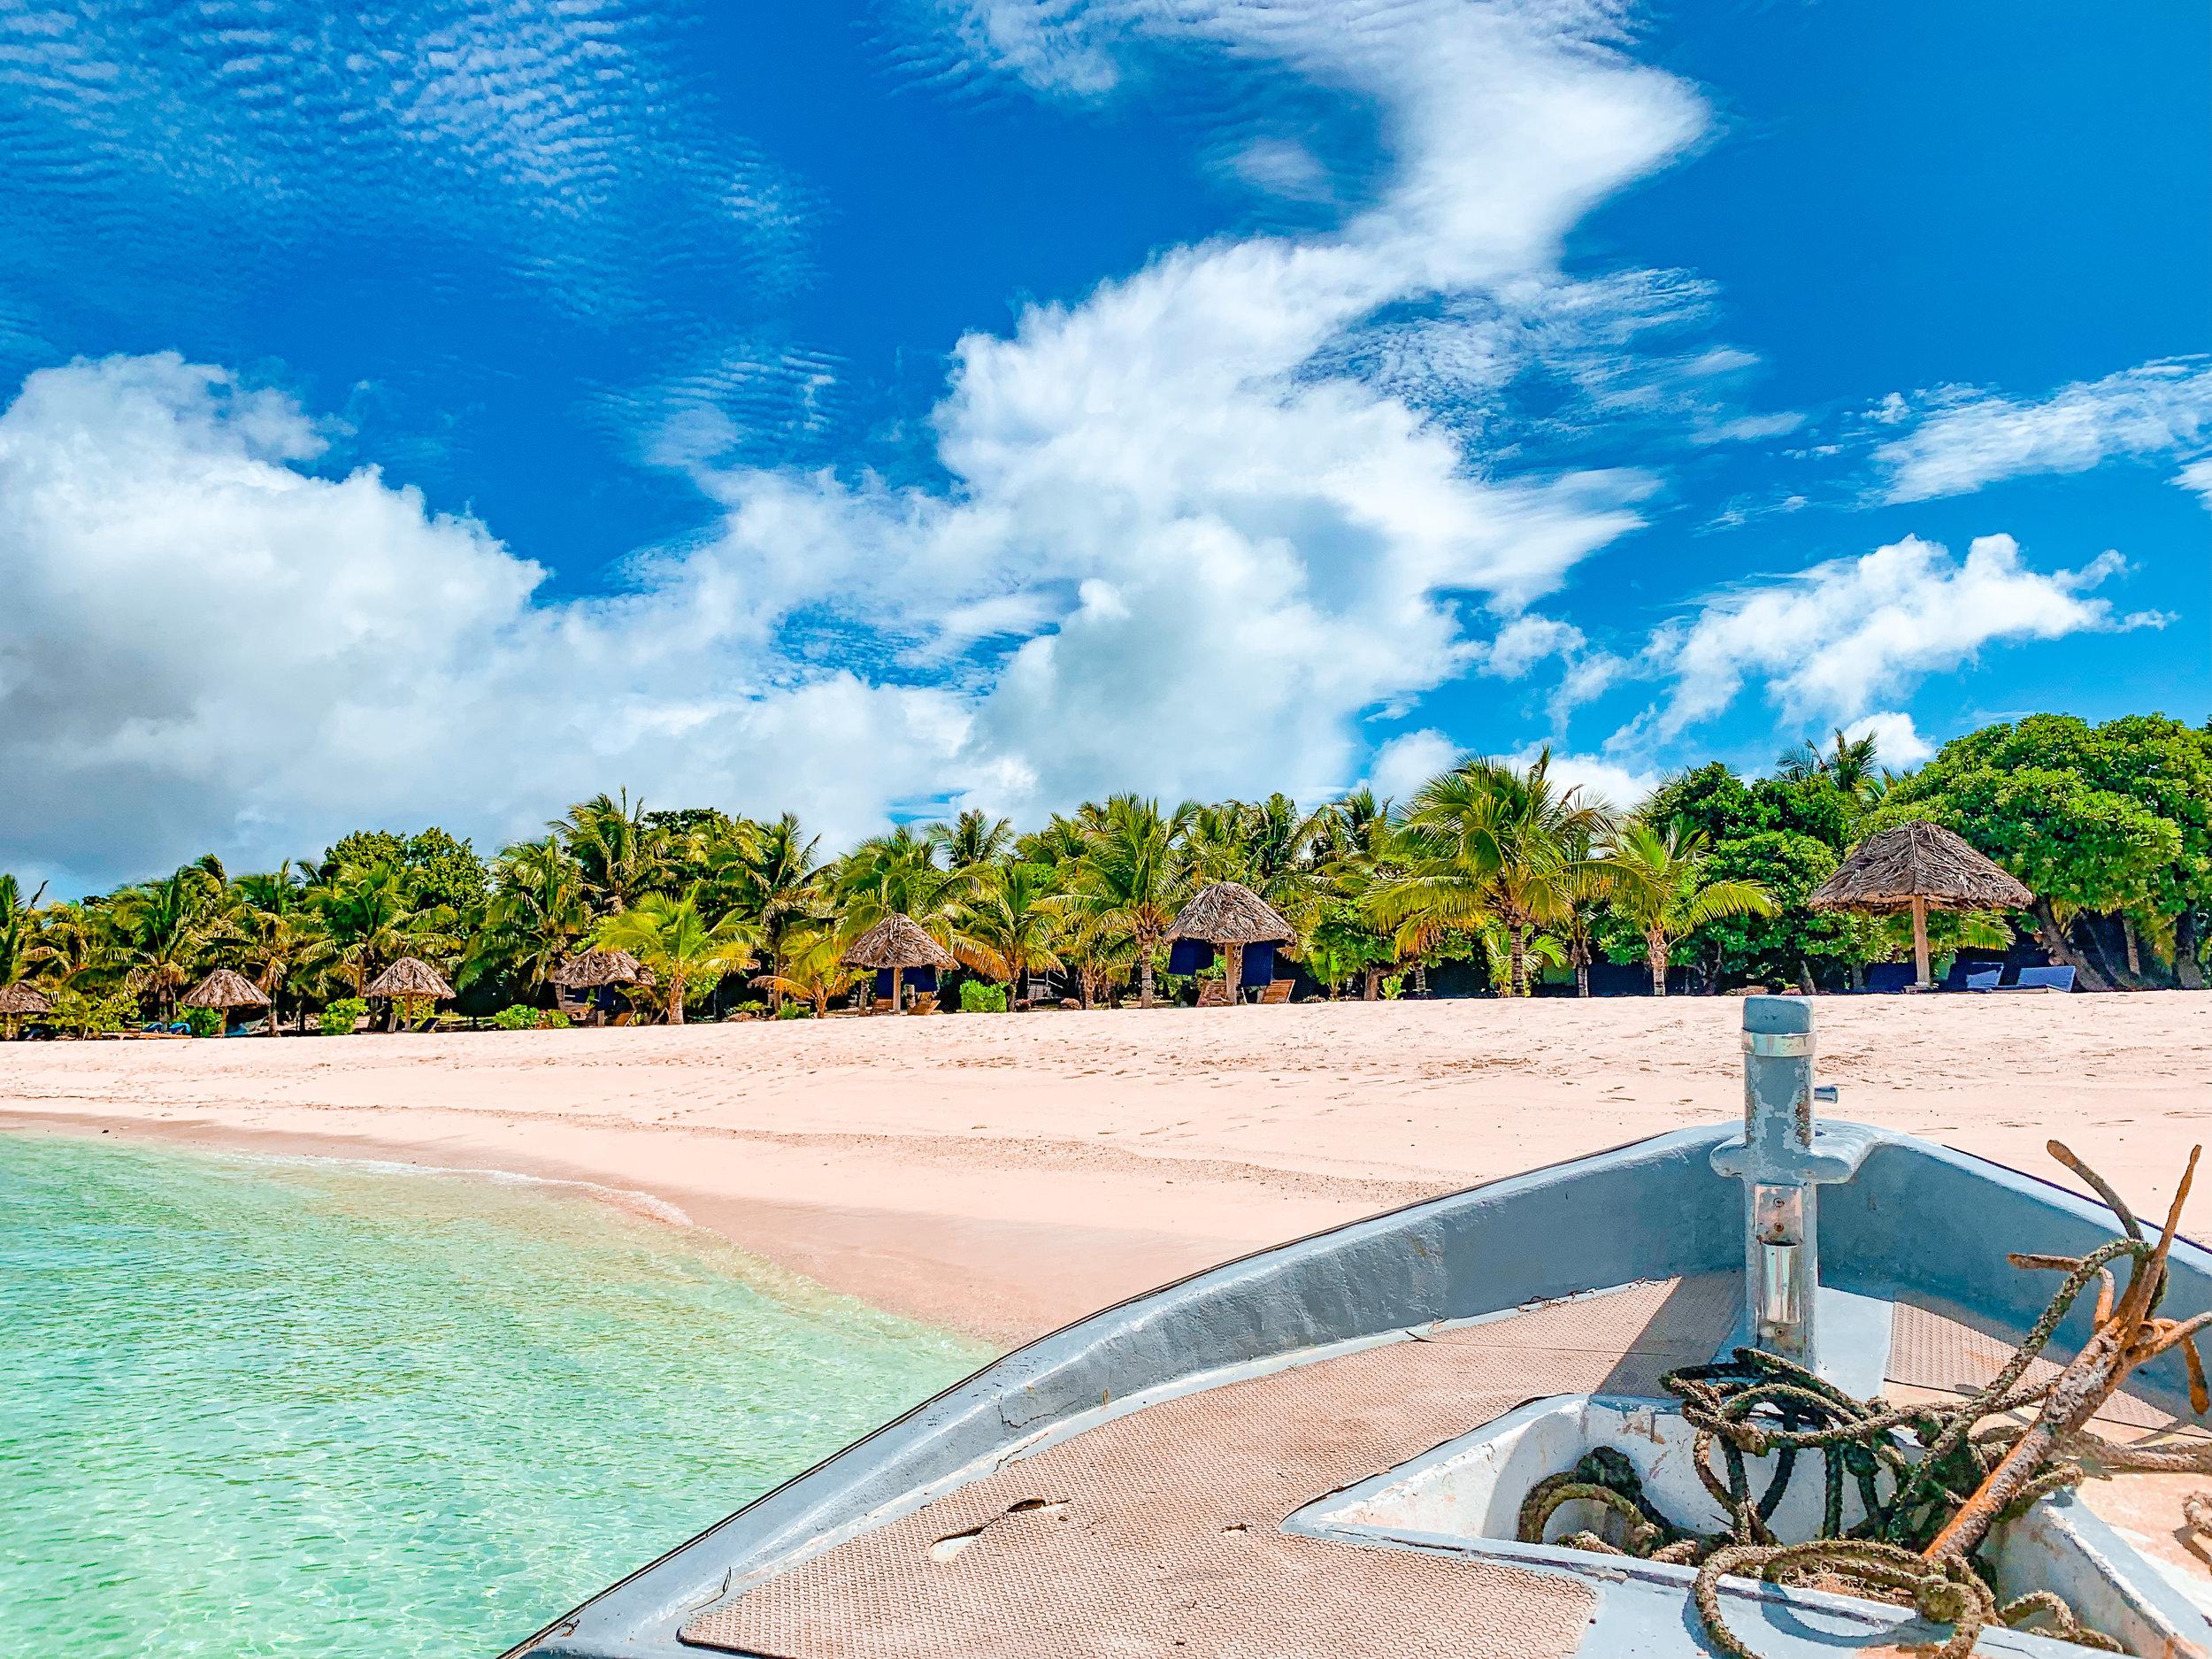 Staying on a Private Island in Romantic Fiji | Honeymoon Ideas | www.coupleinthekitchen.com